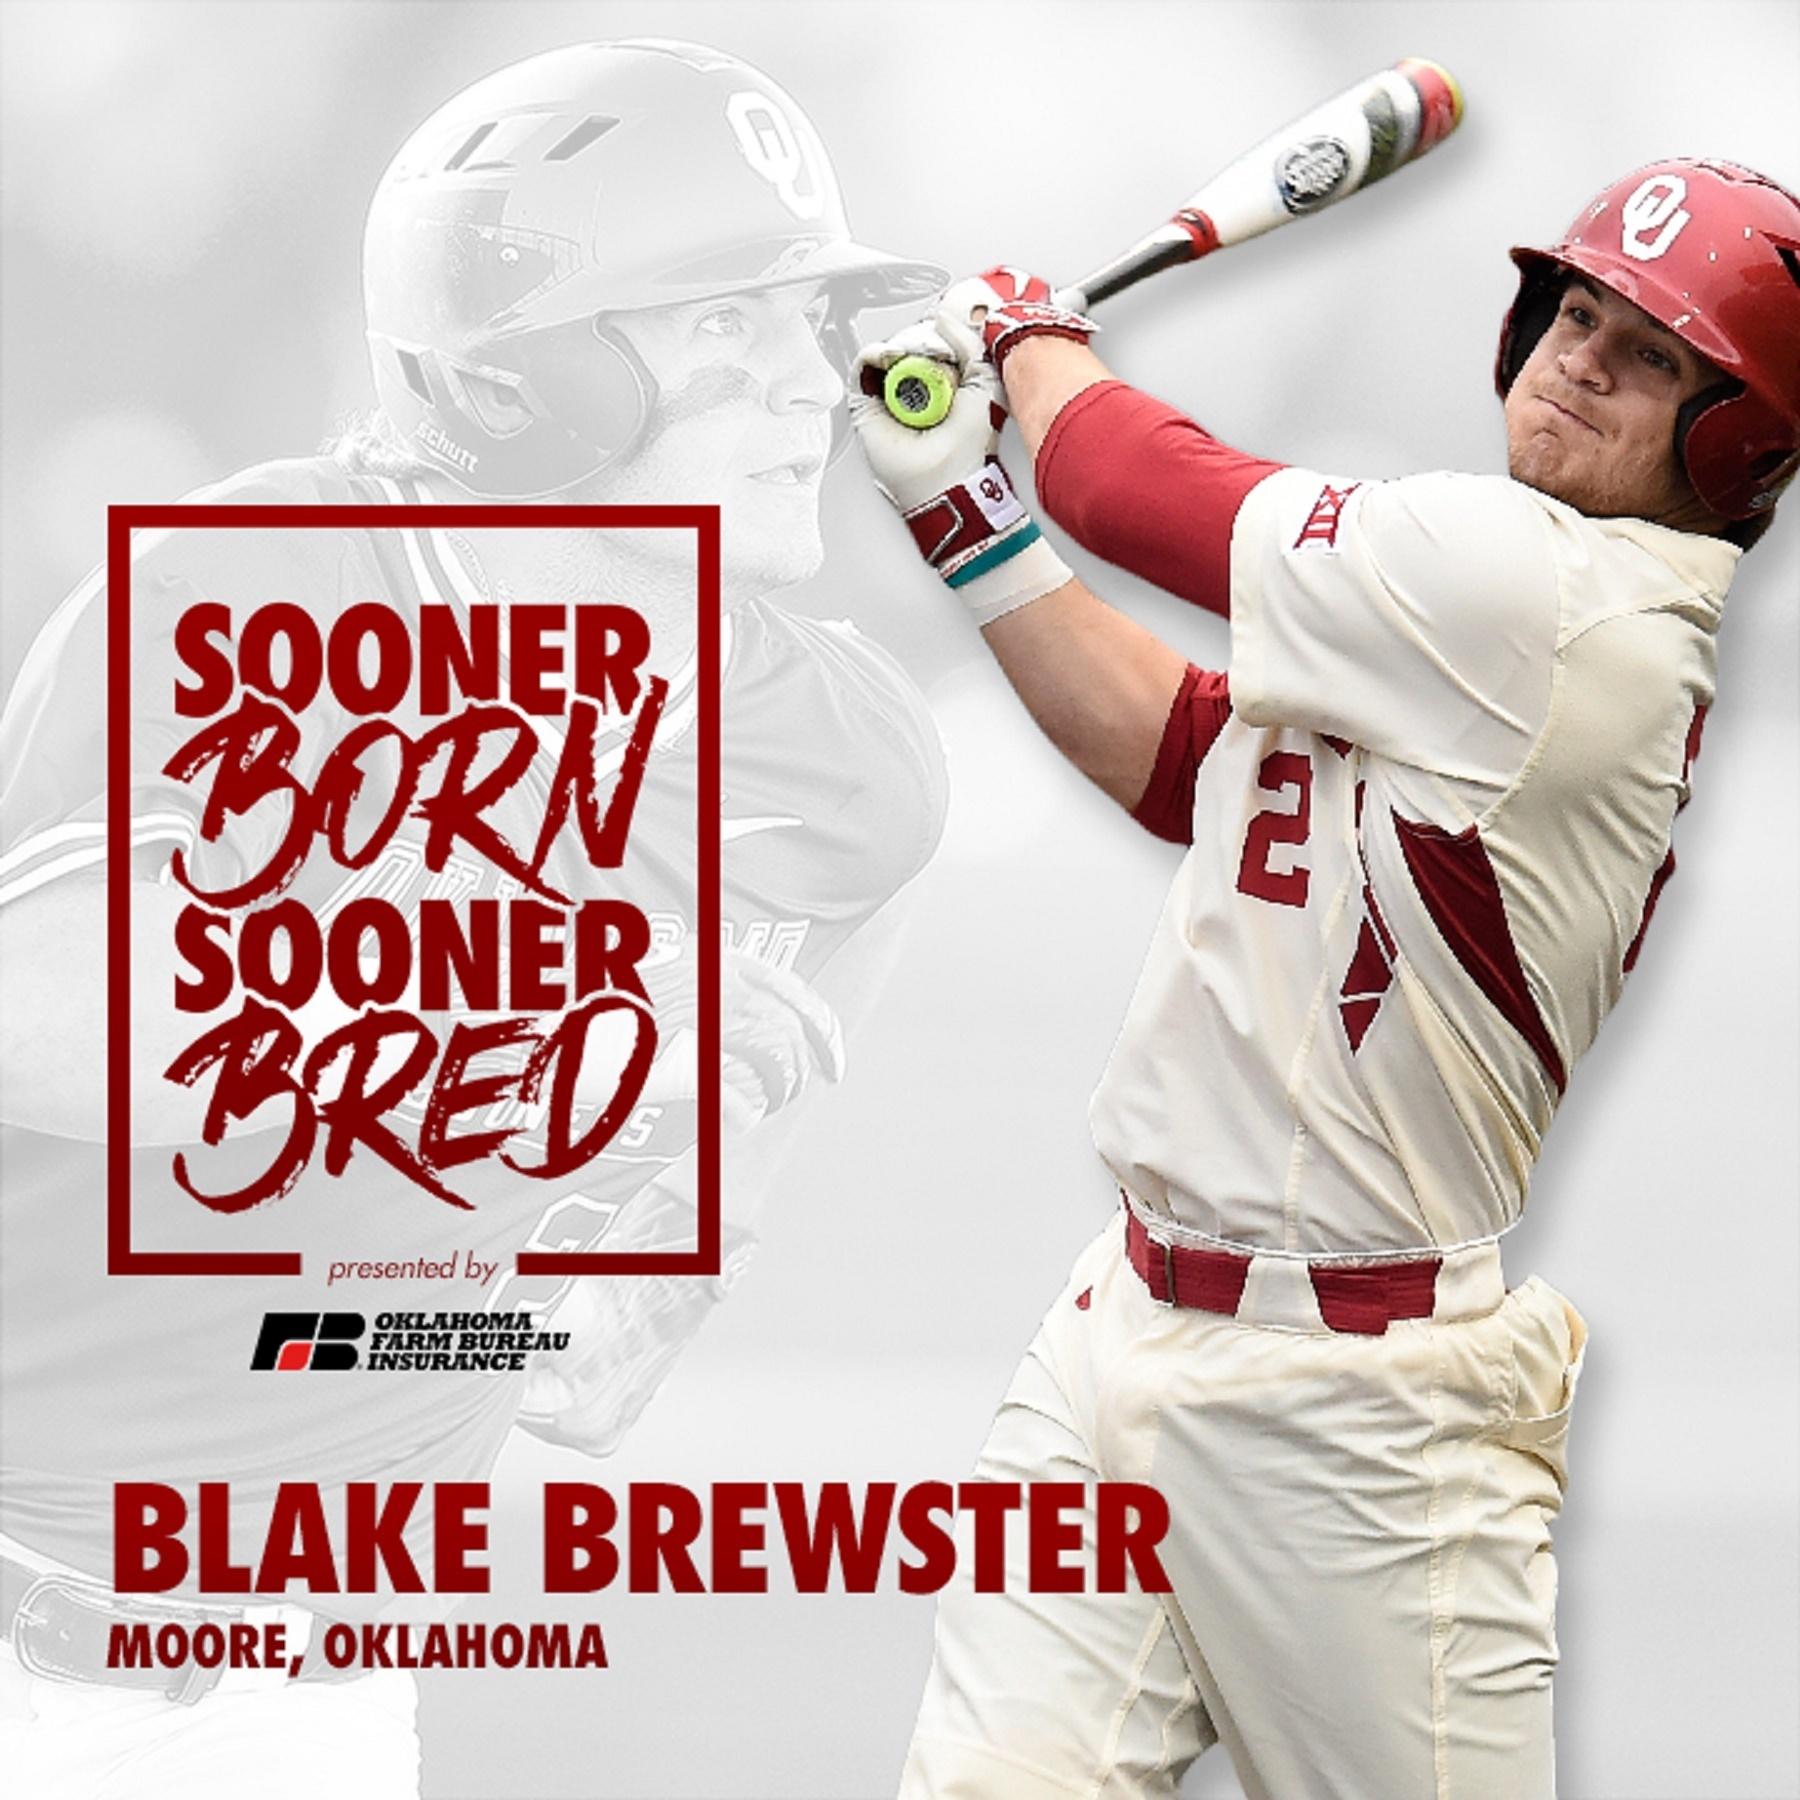 Sooner Born Sooner Bred Sooner Baseball standout Blake Brewster. Junior Outfielder form Moore, Oklahoma